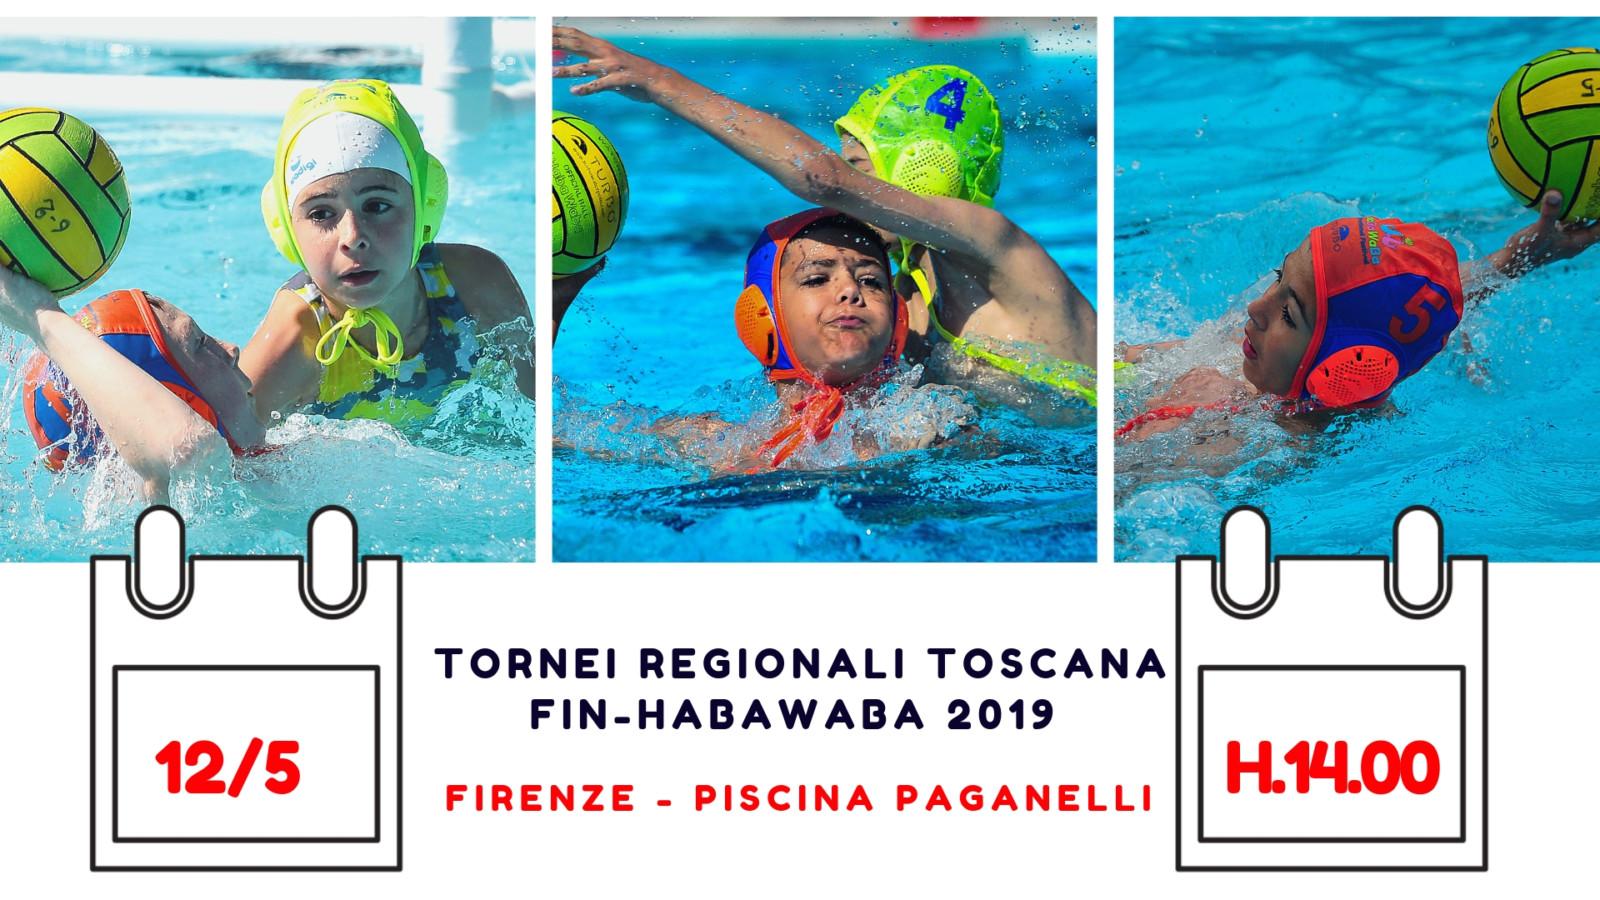 tornei regionali TOSCANA fin-habawaba 2019 day 1